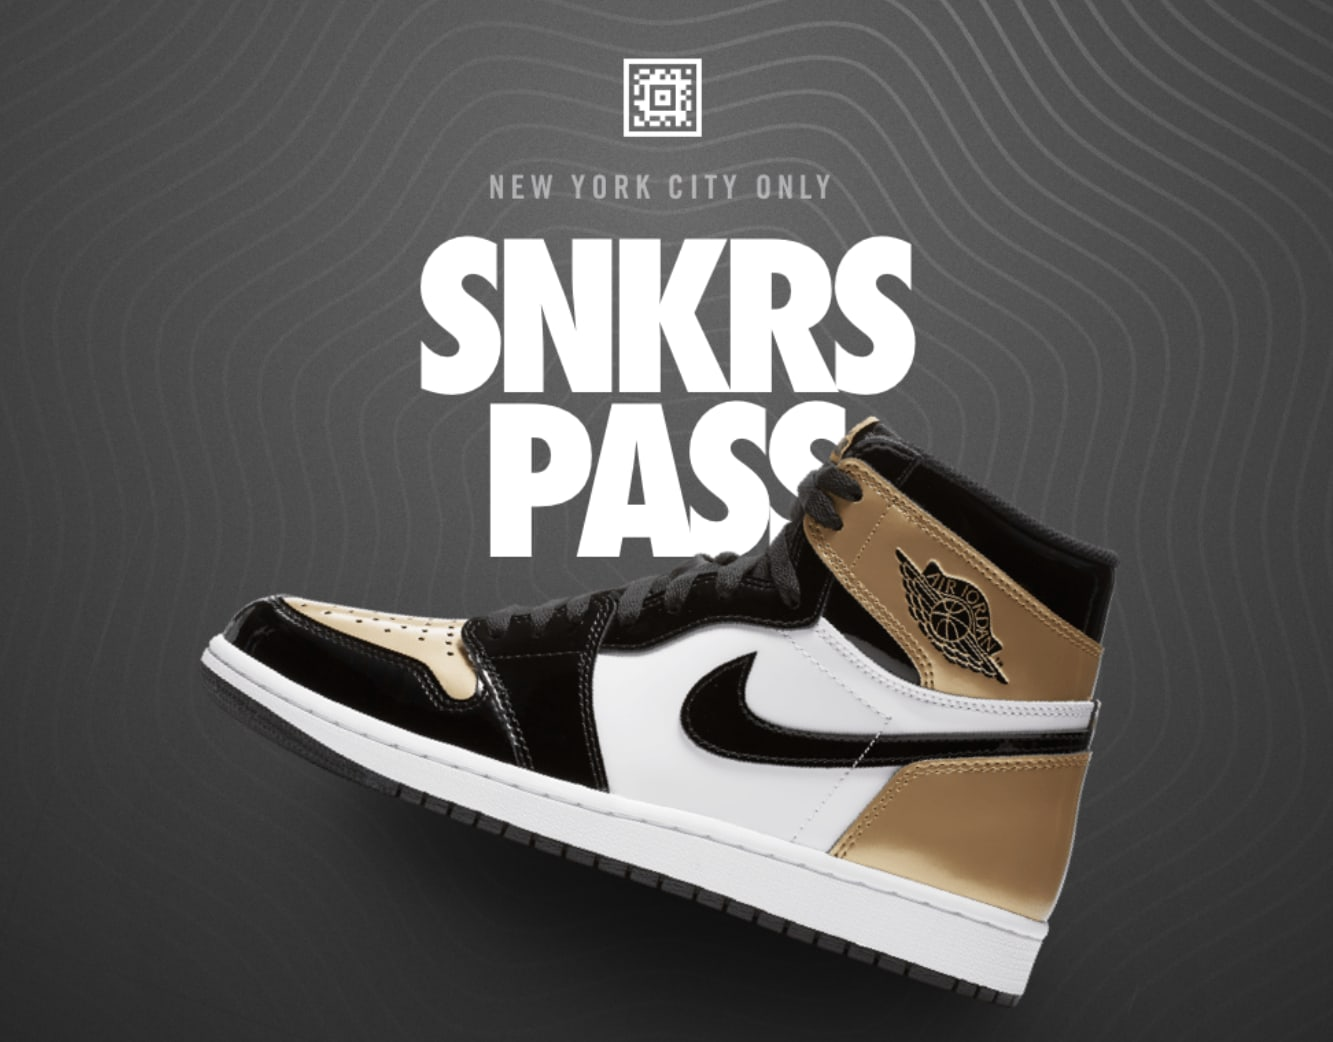 Air Jordan 1 'NRG' Nike SNKRS Pass